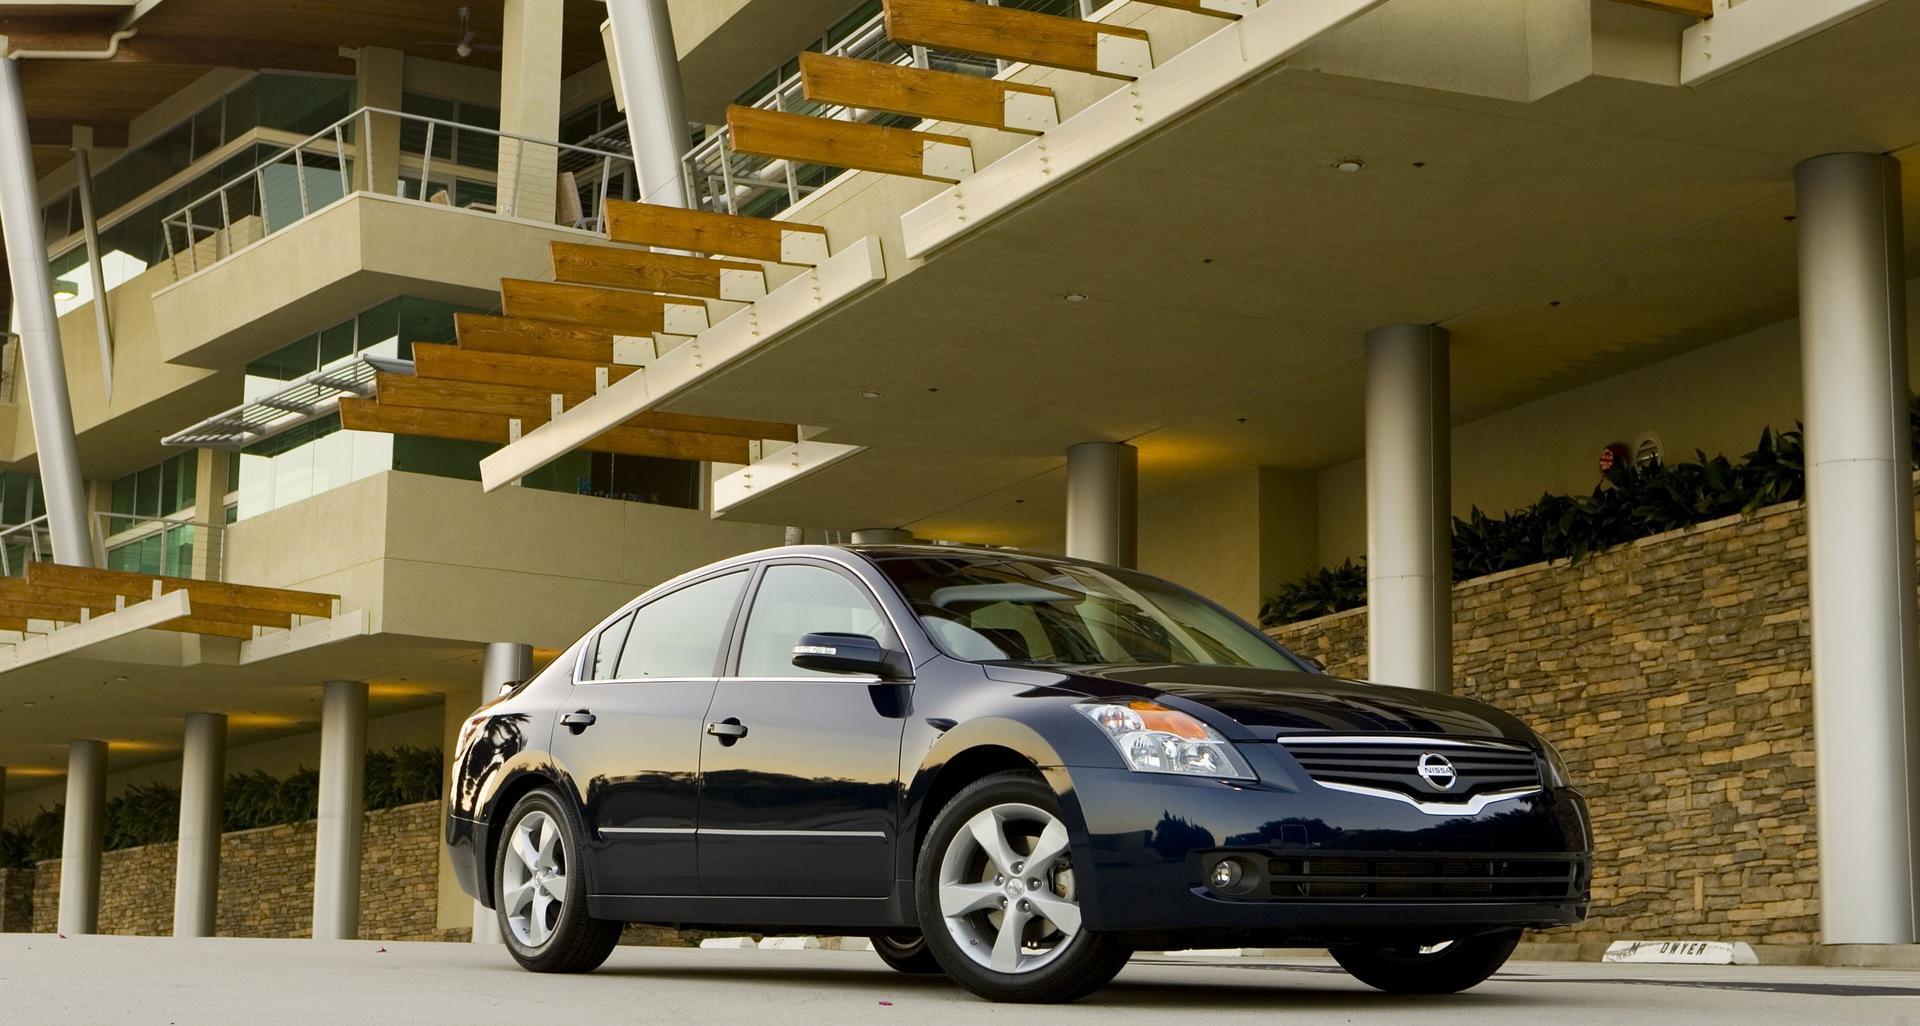 Nissan Altima: Upper half